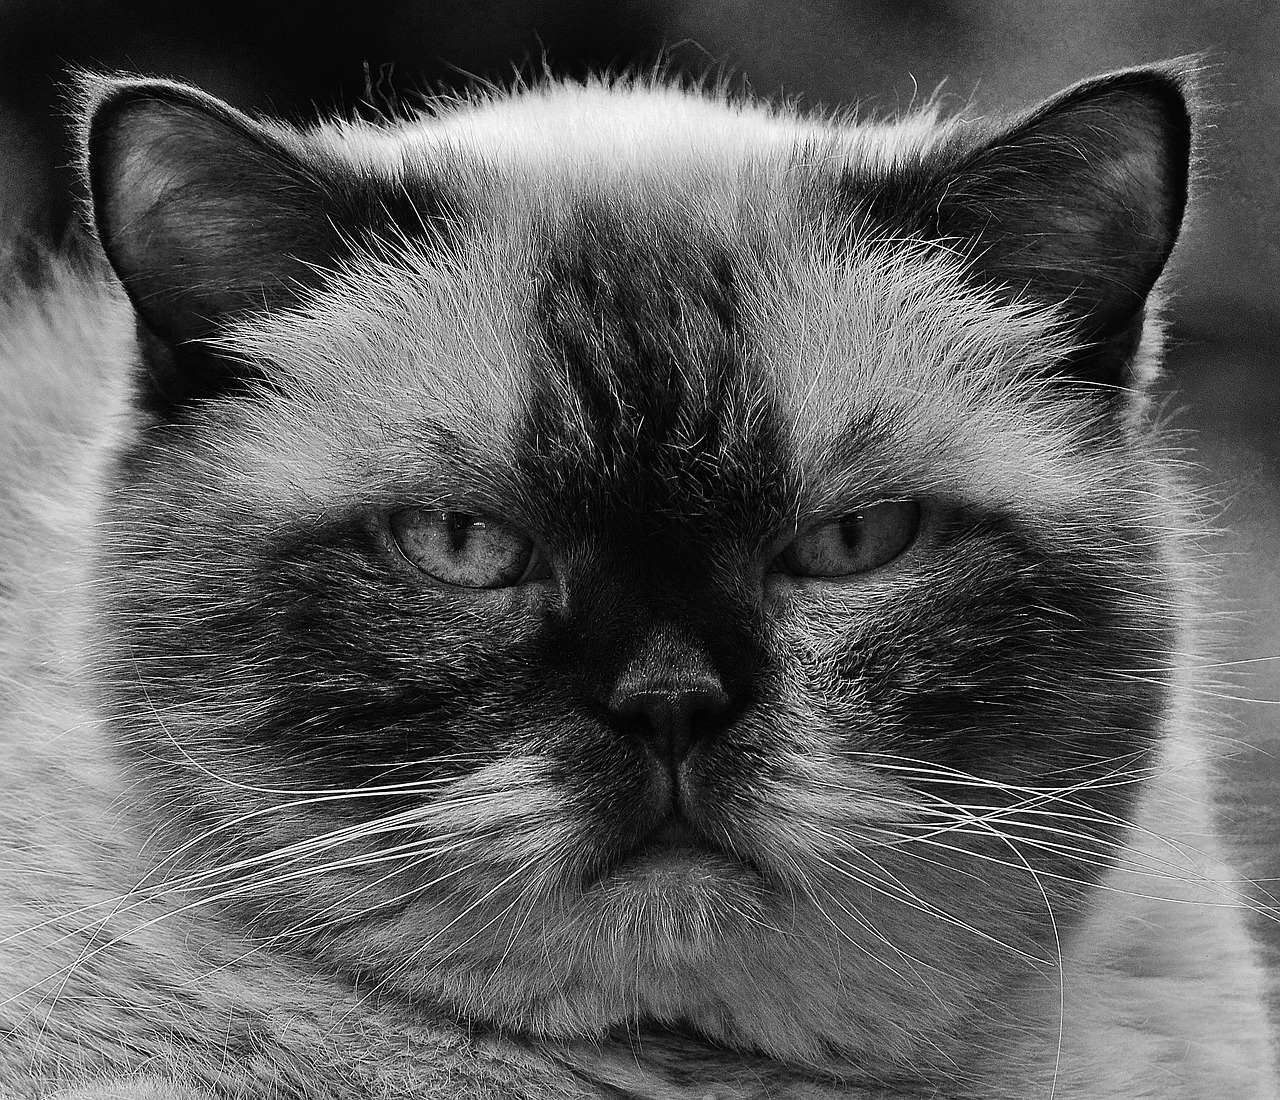 cat-1615641_1280.jpg